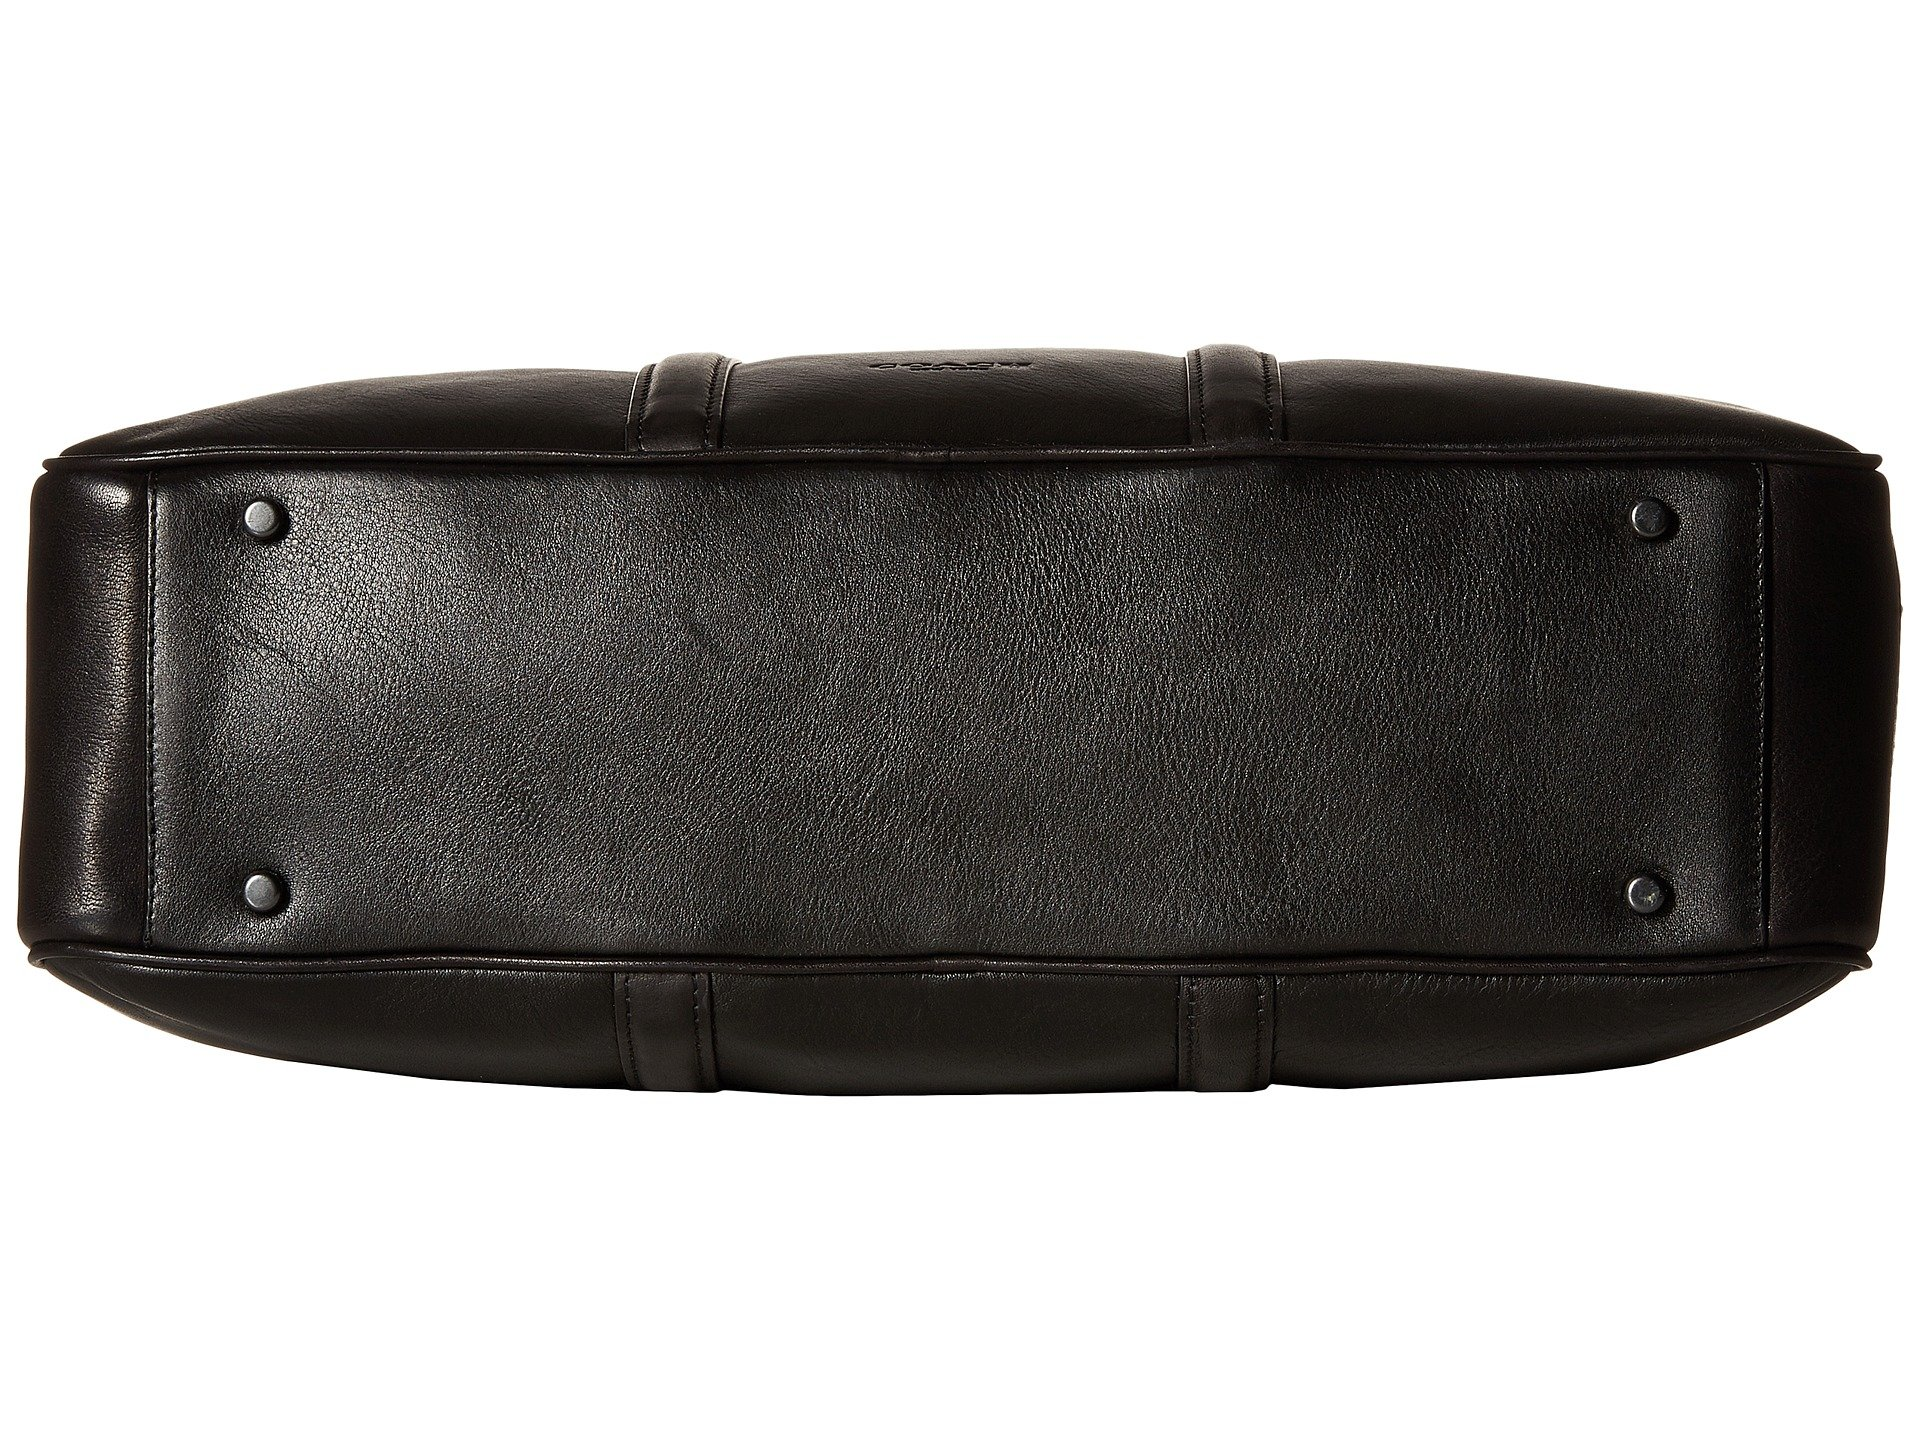 2014 New Portable Longchamp 1948 Coin Bags Black